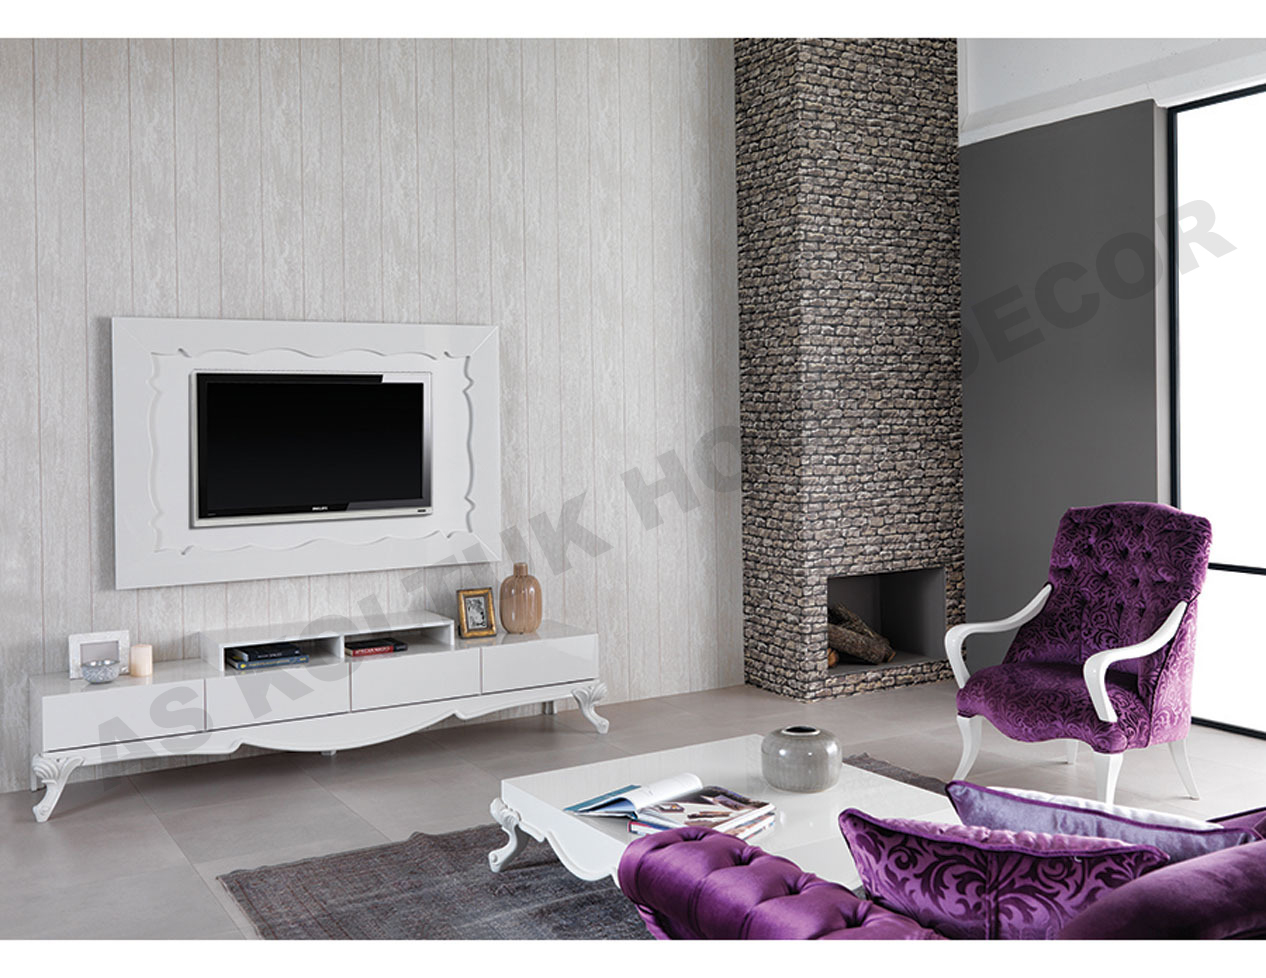 purple sofas for sale used sofa and loveseat as koltuk home decor classic set